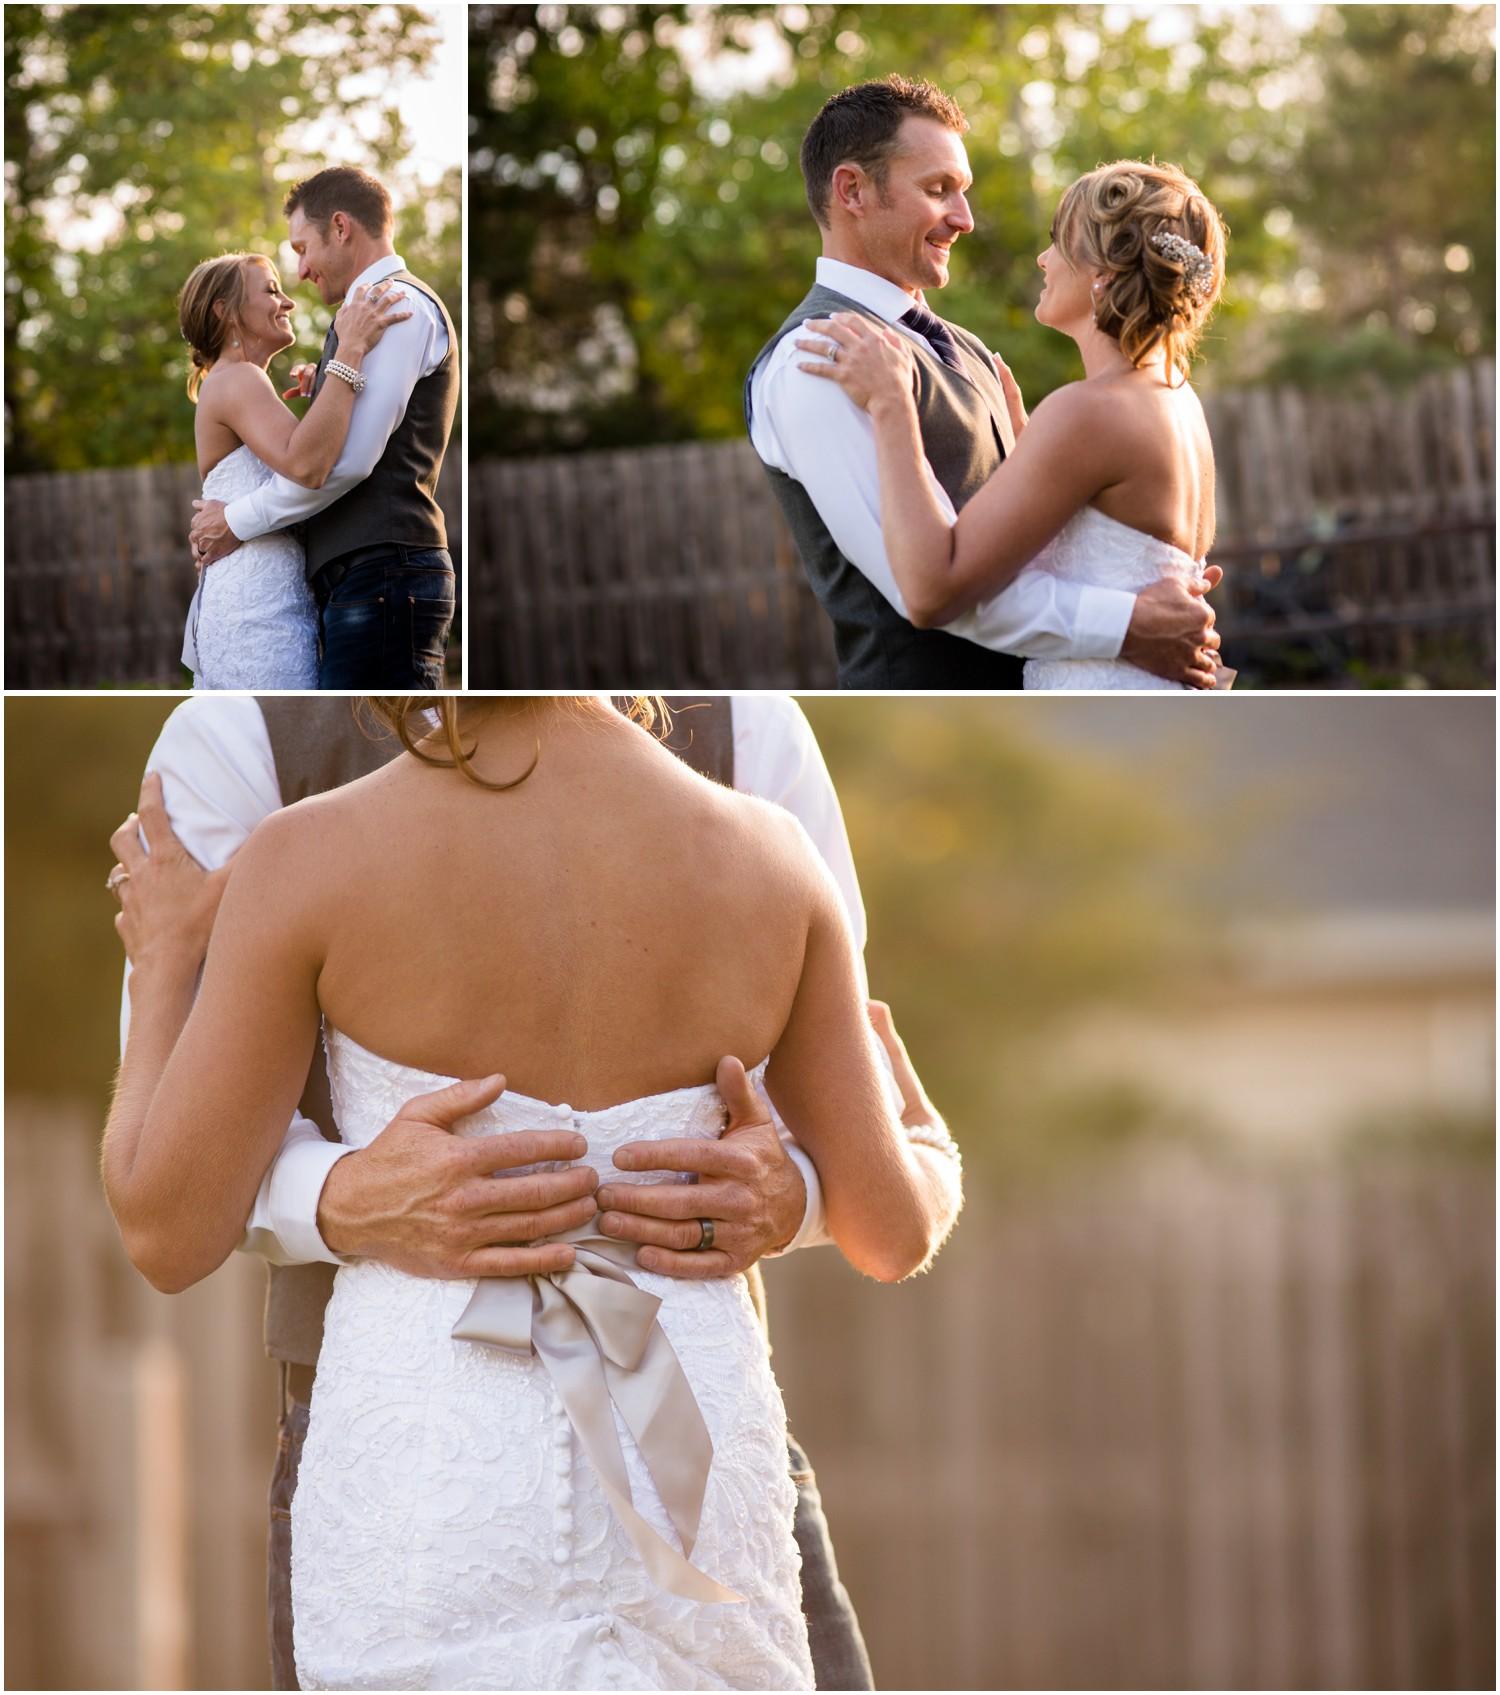 Windsor-colorado-backyard-wedding-photography-_0073.jpg